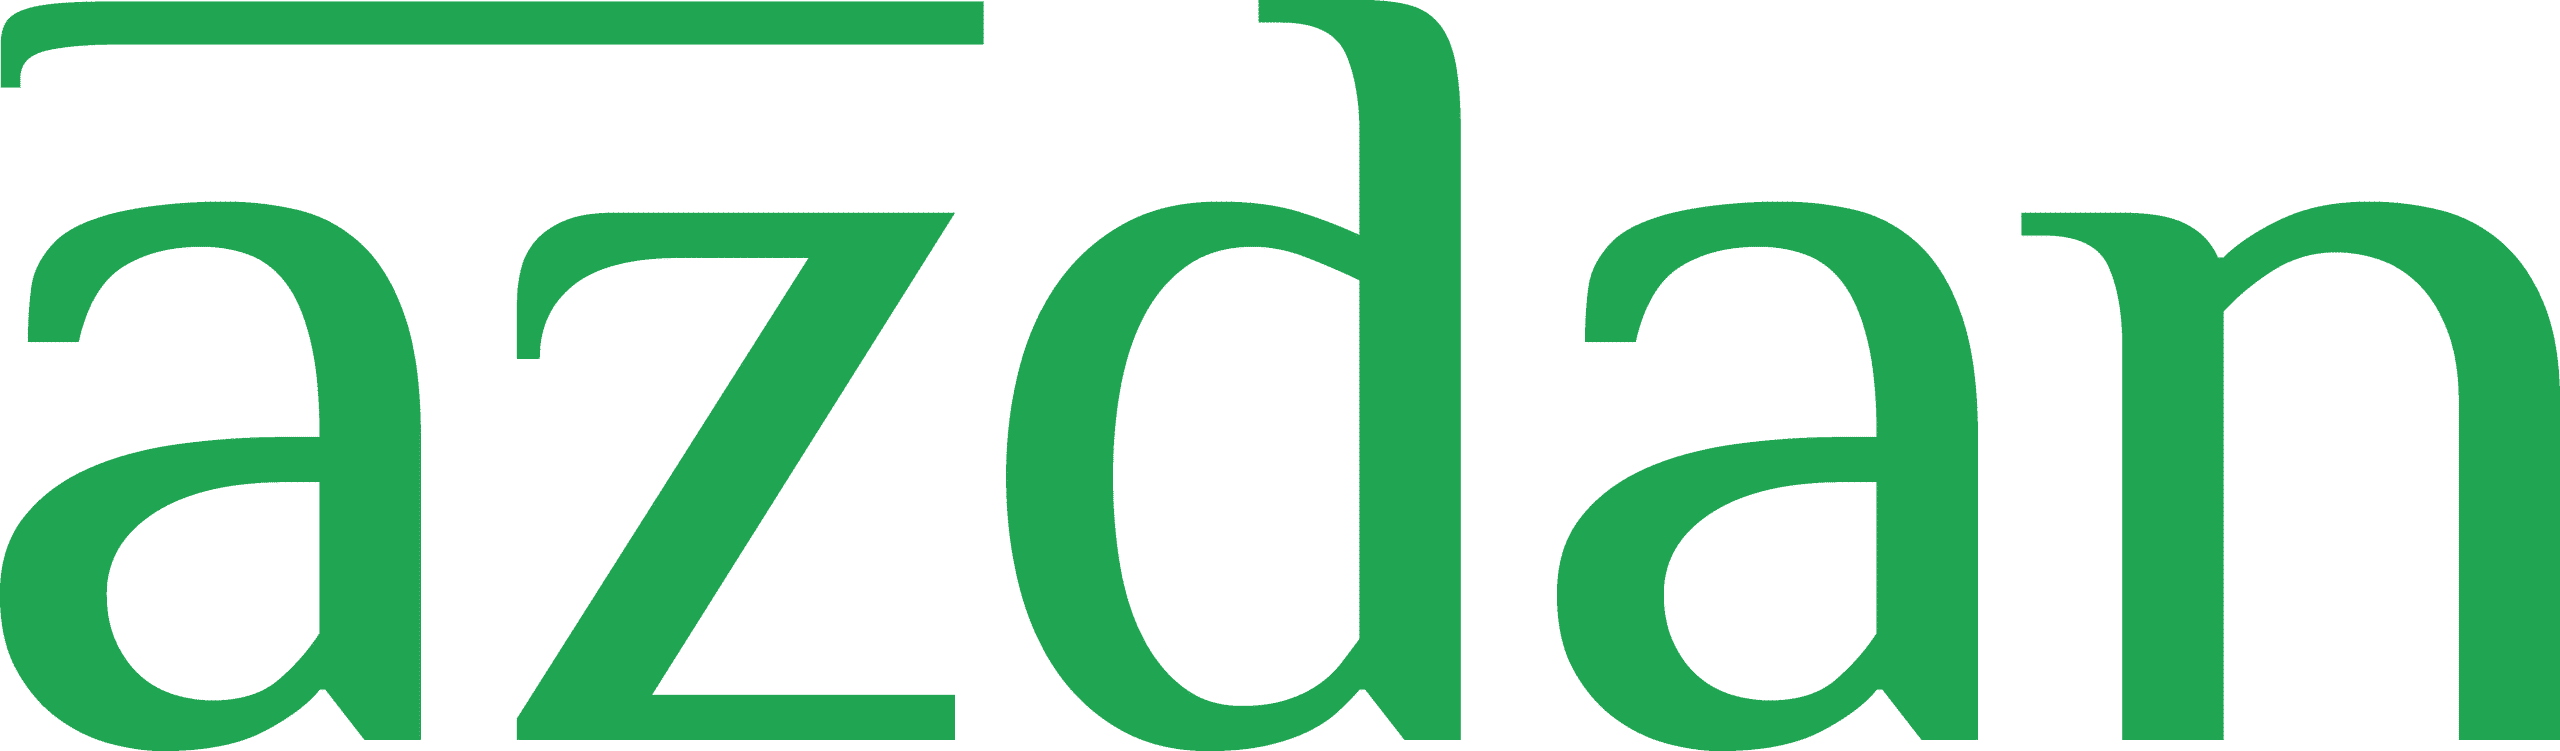 Azdan logo png